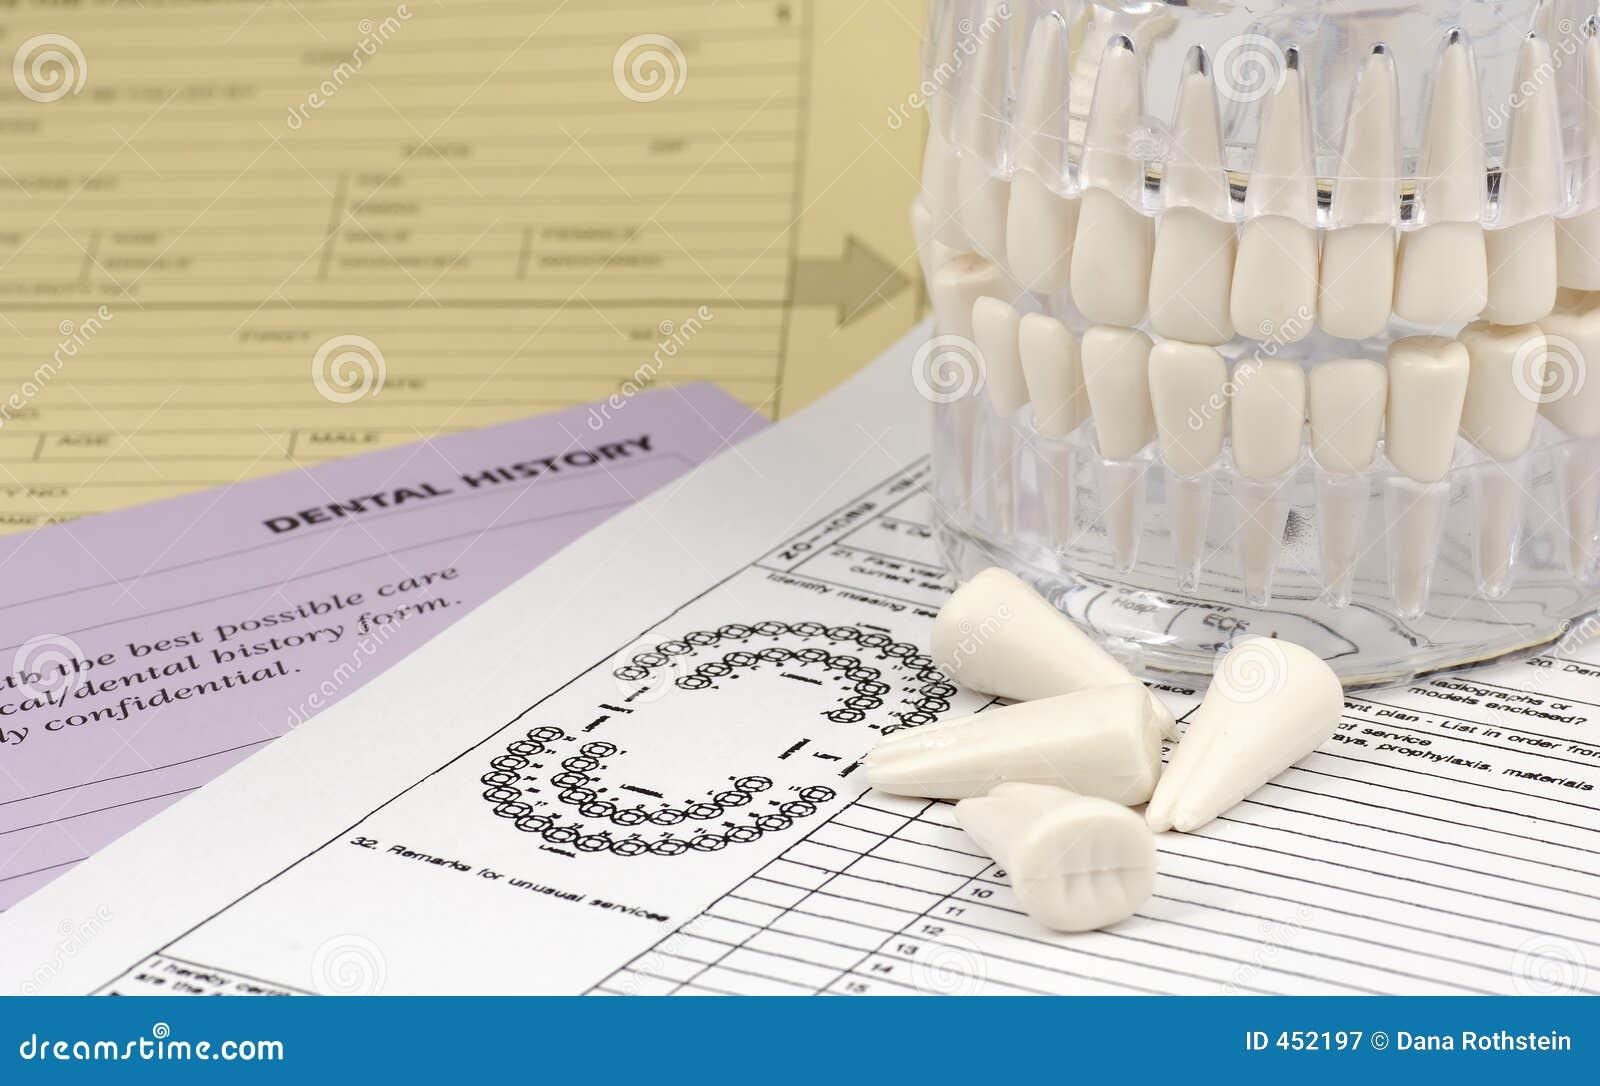 Dental Forms